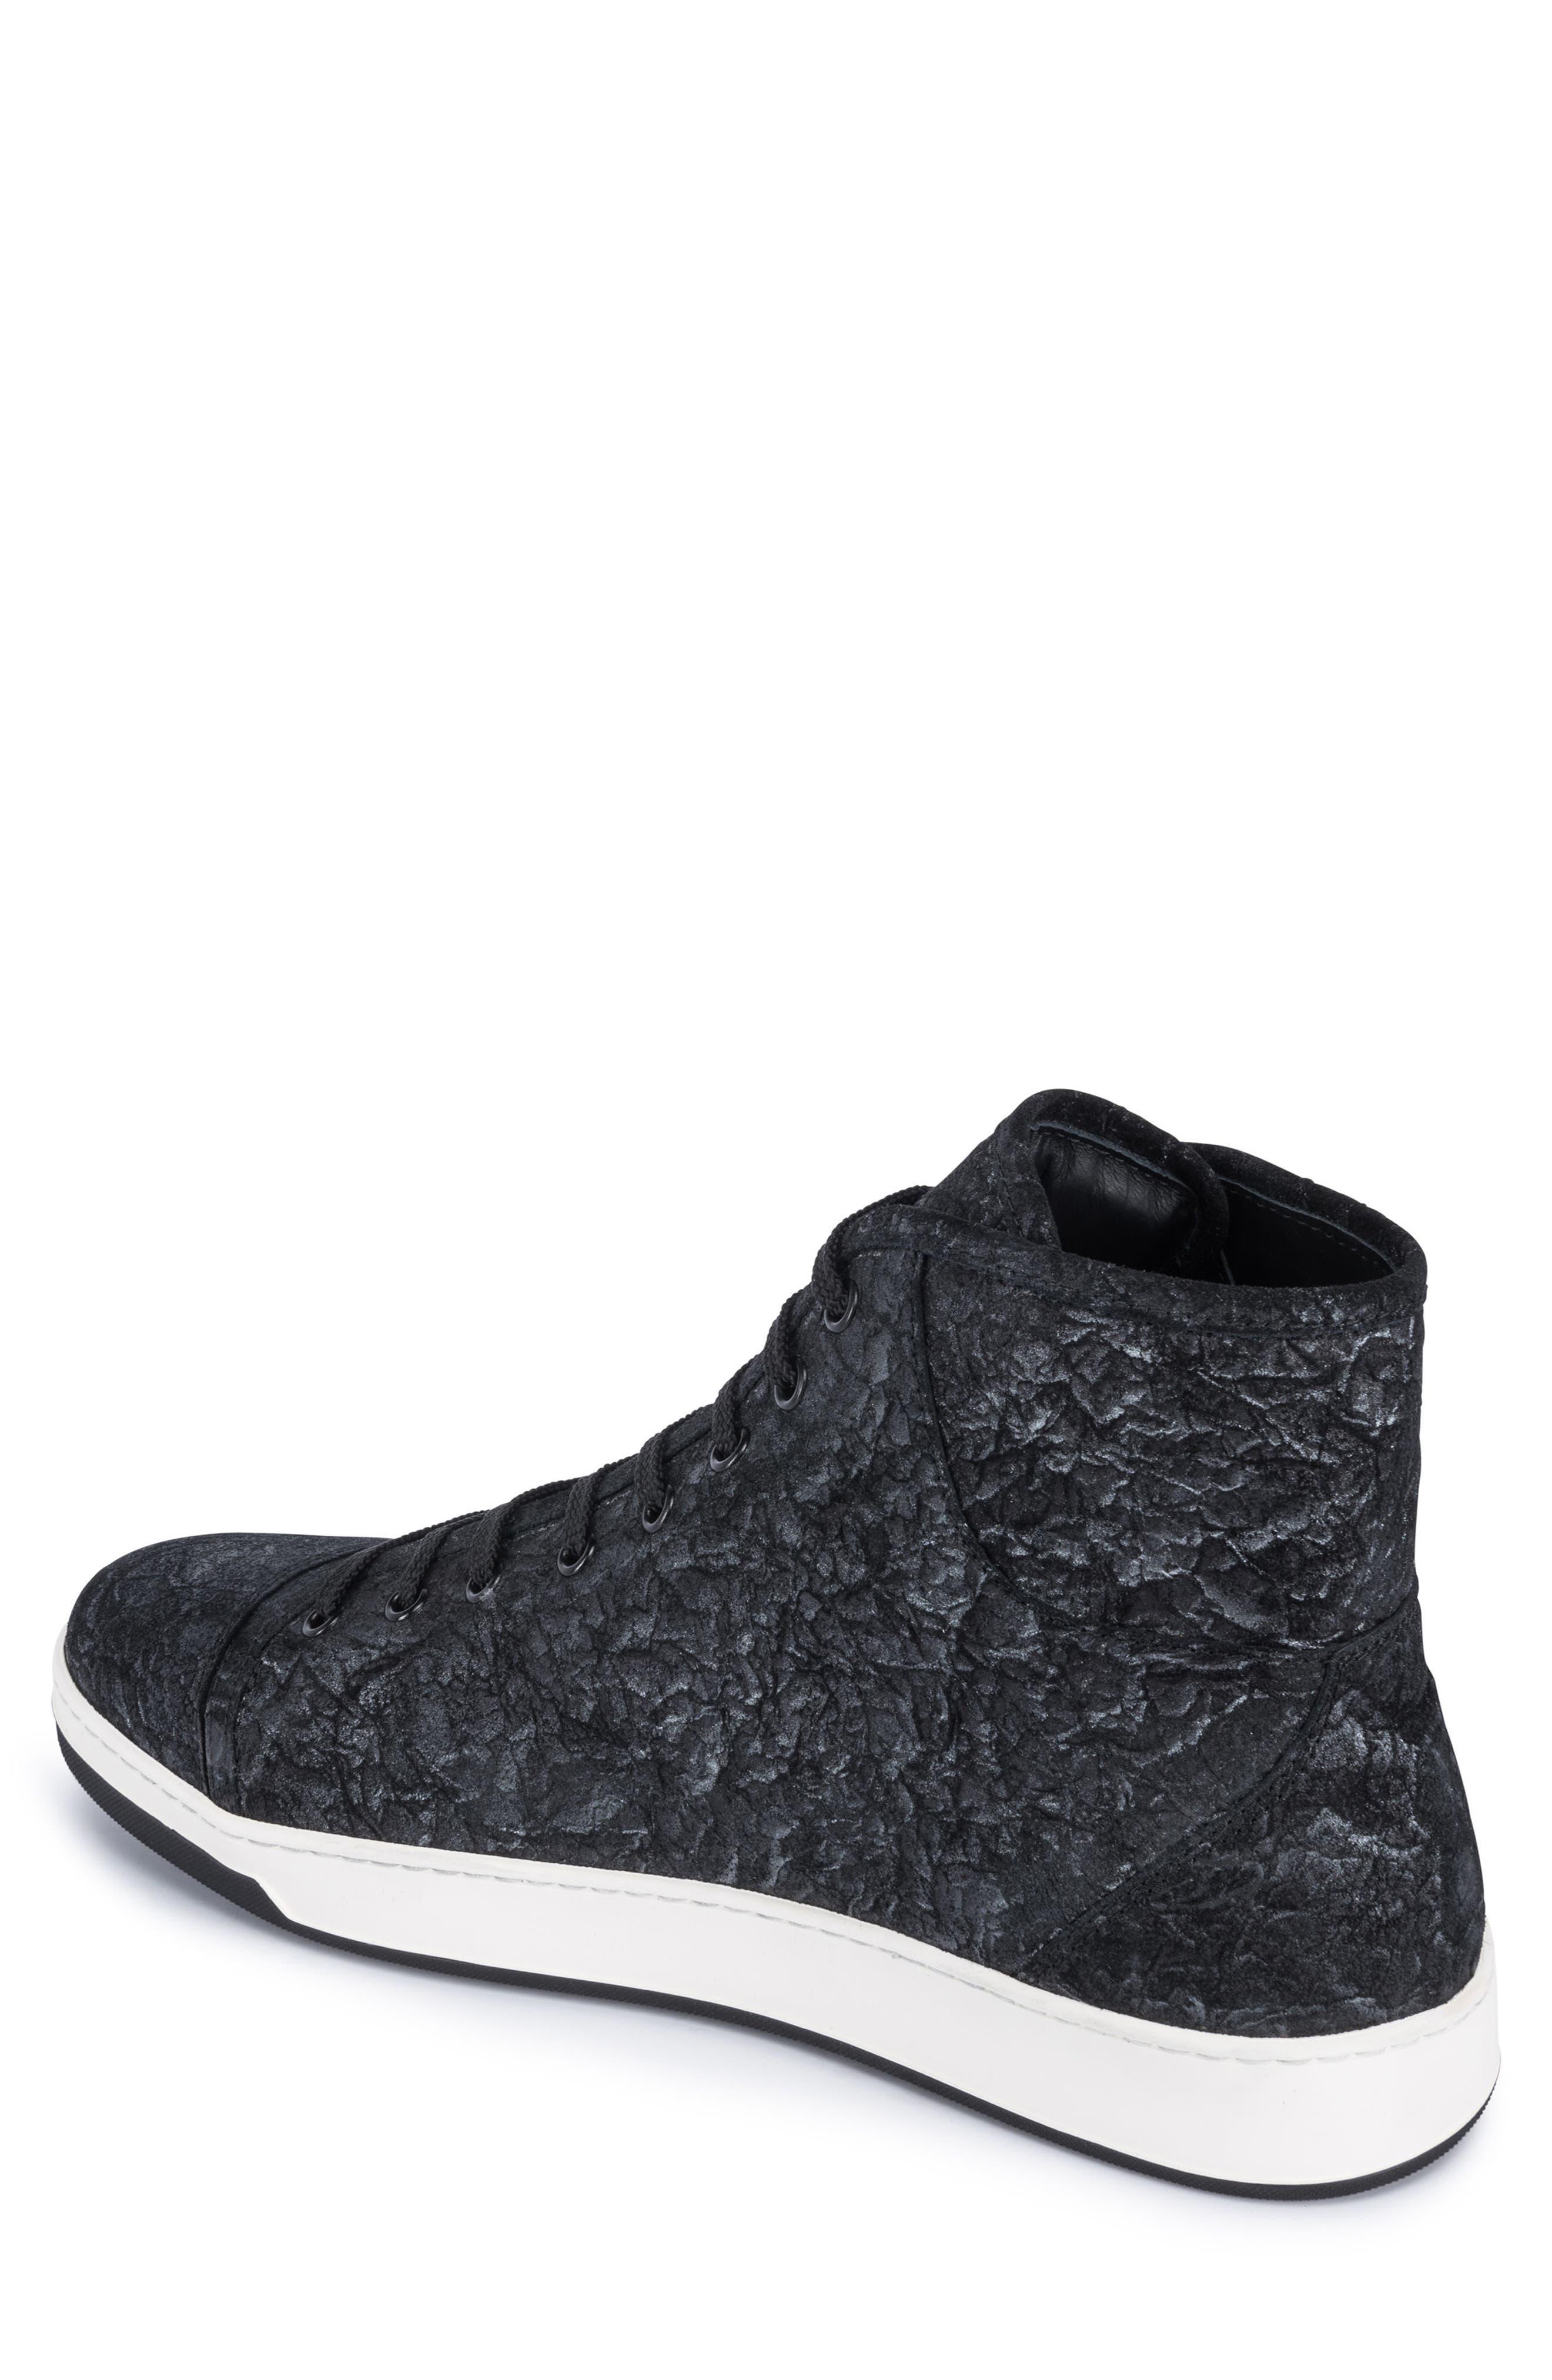 Pompeii Sneaker,                             Alternate thumbnail 2, color,                             Nero